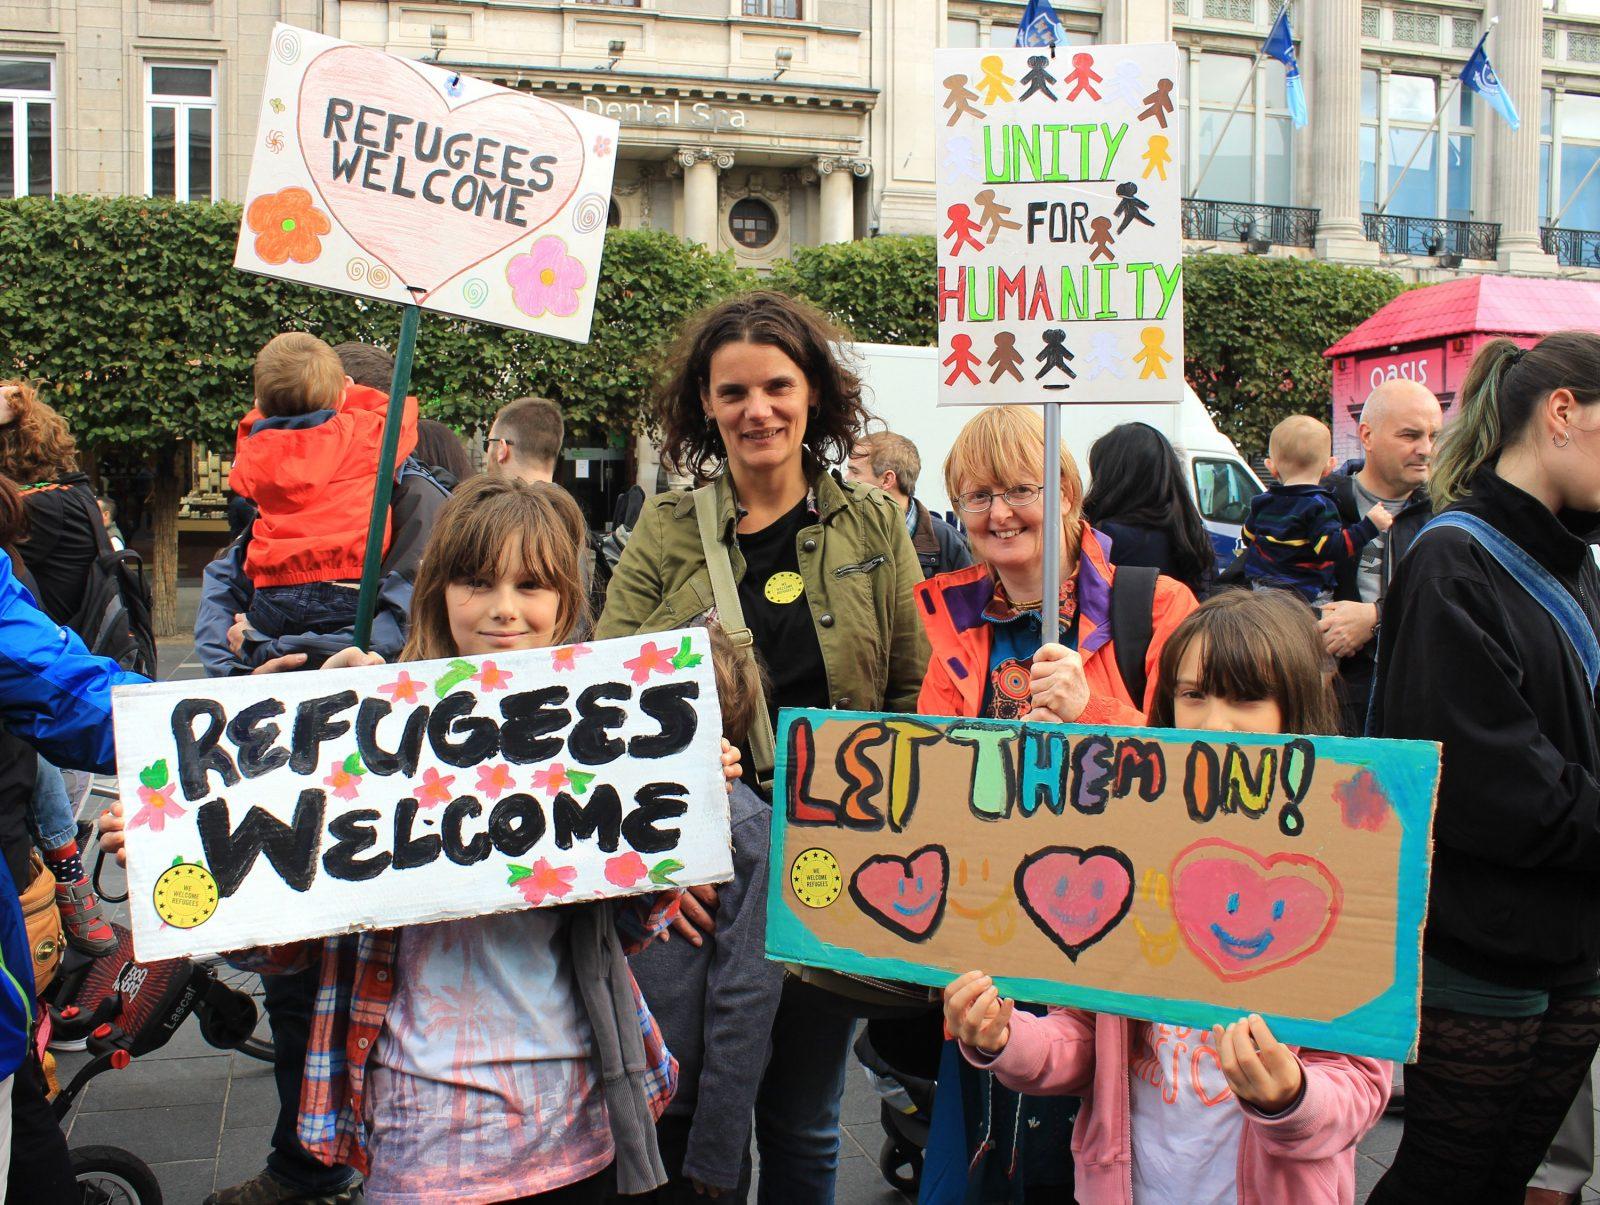 Vox pop: Dublin refugee solidarity rally